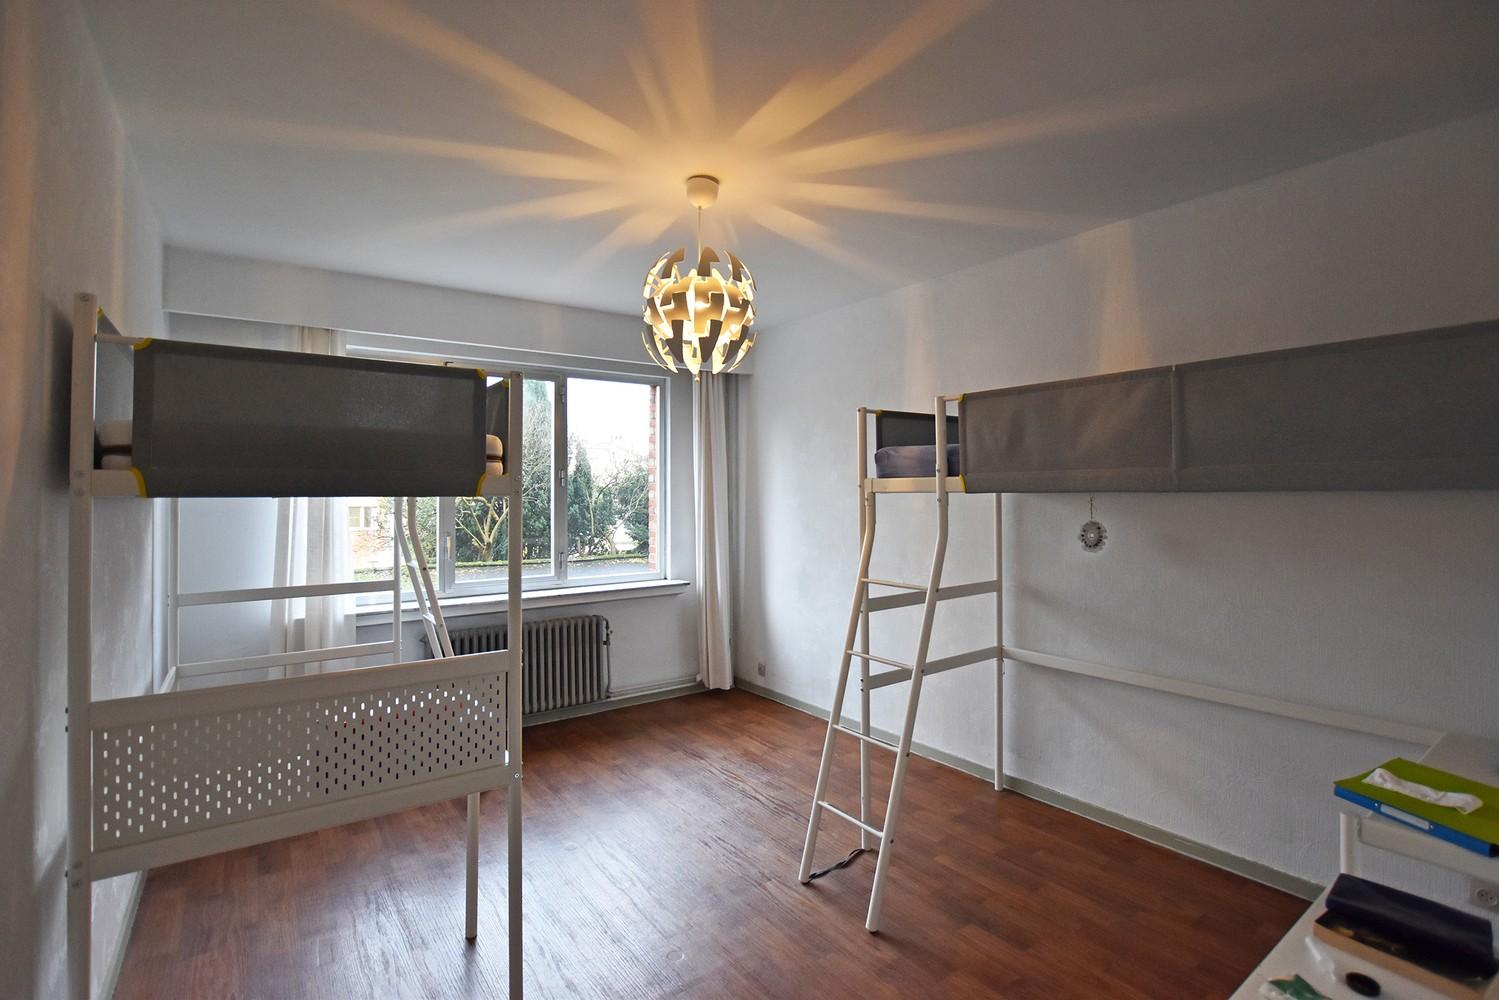 Ruim appartement (+/- 110 m²) met twee slaapkamers en lift te Borgerhout! afbeelding 6